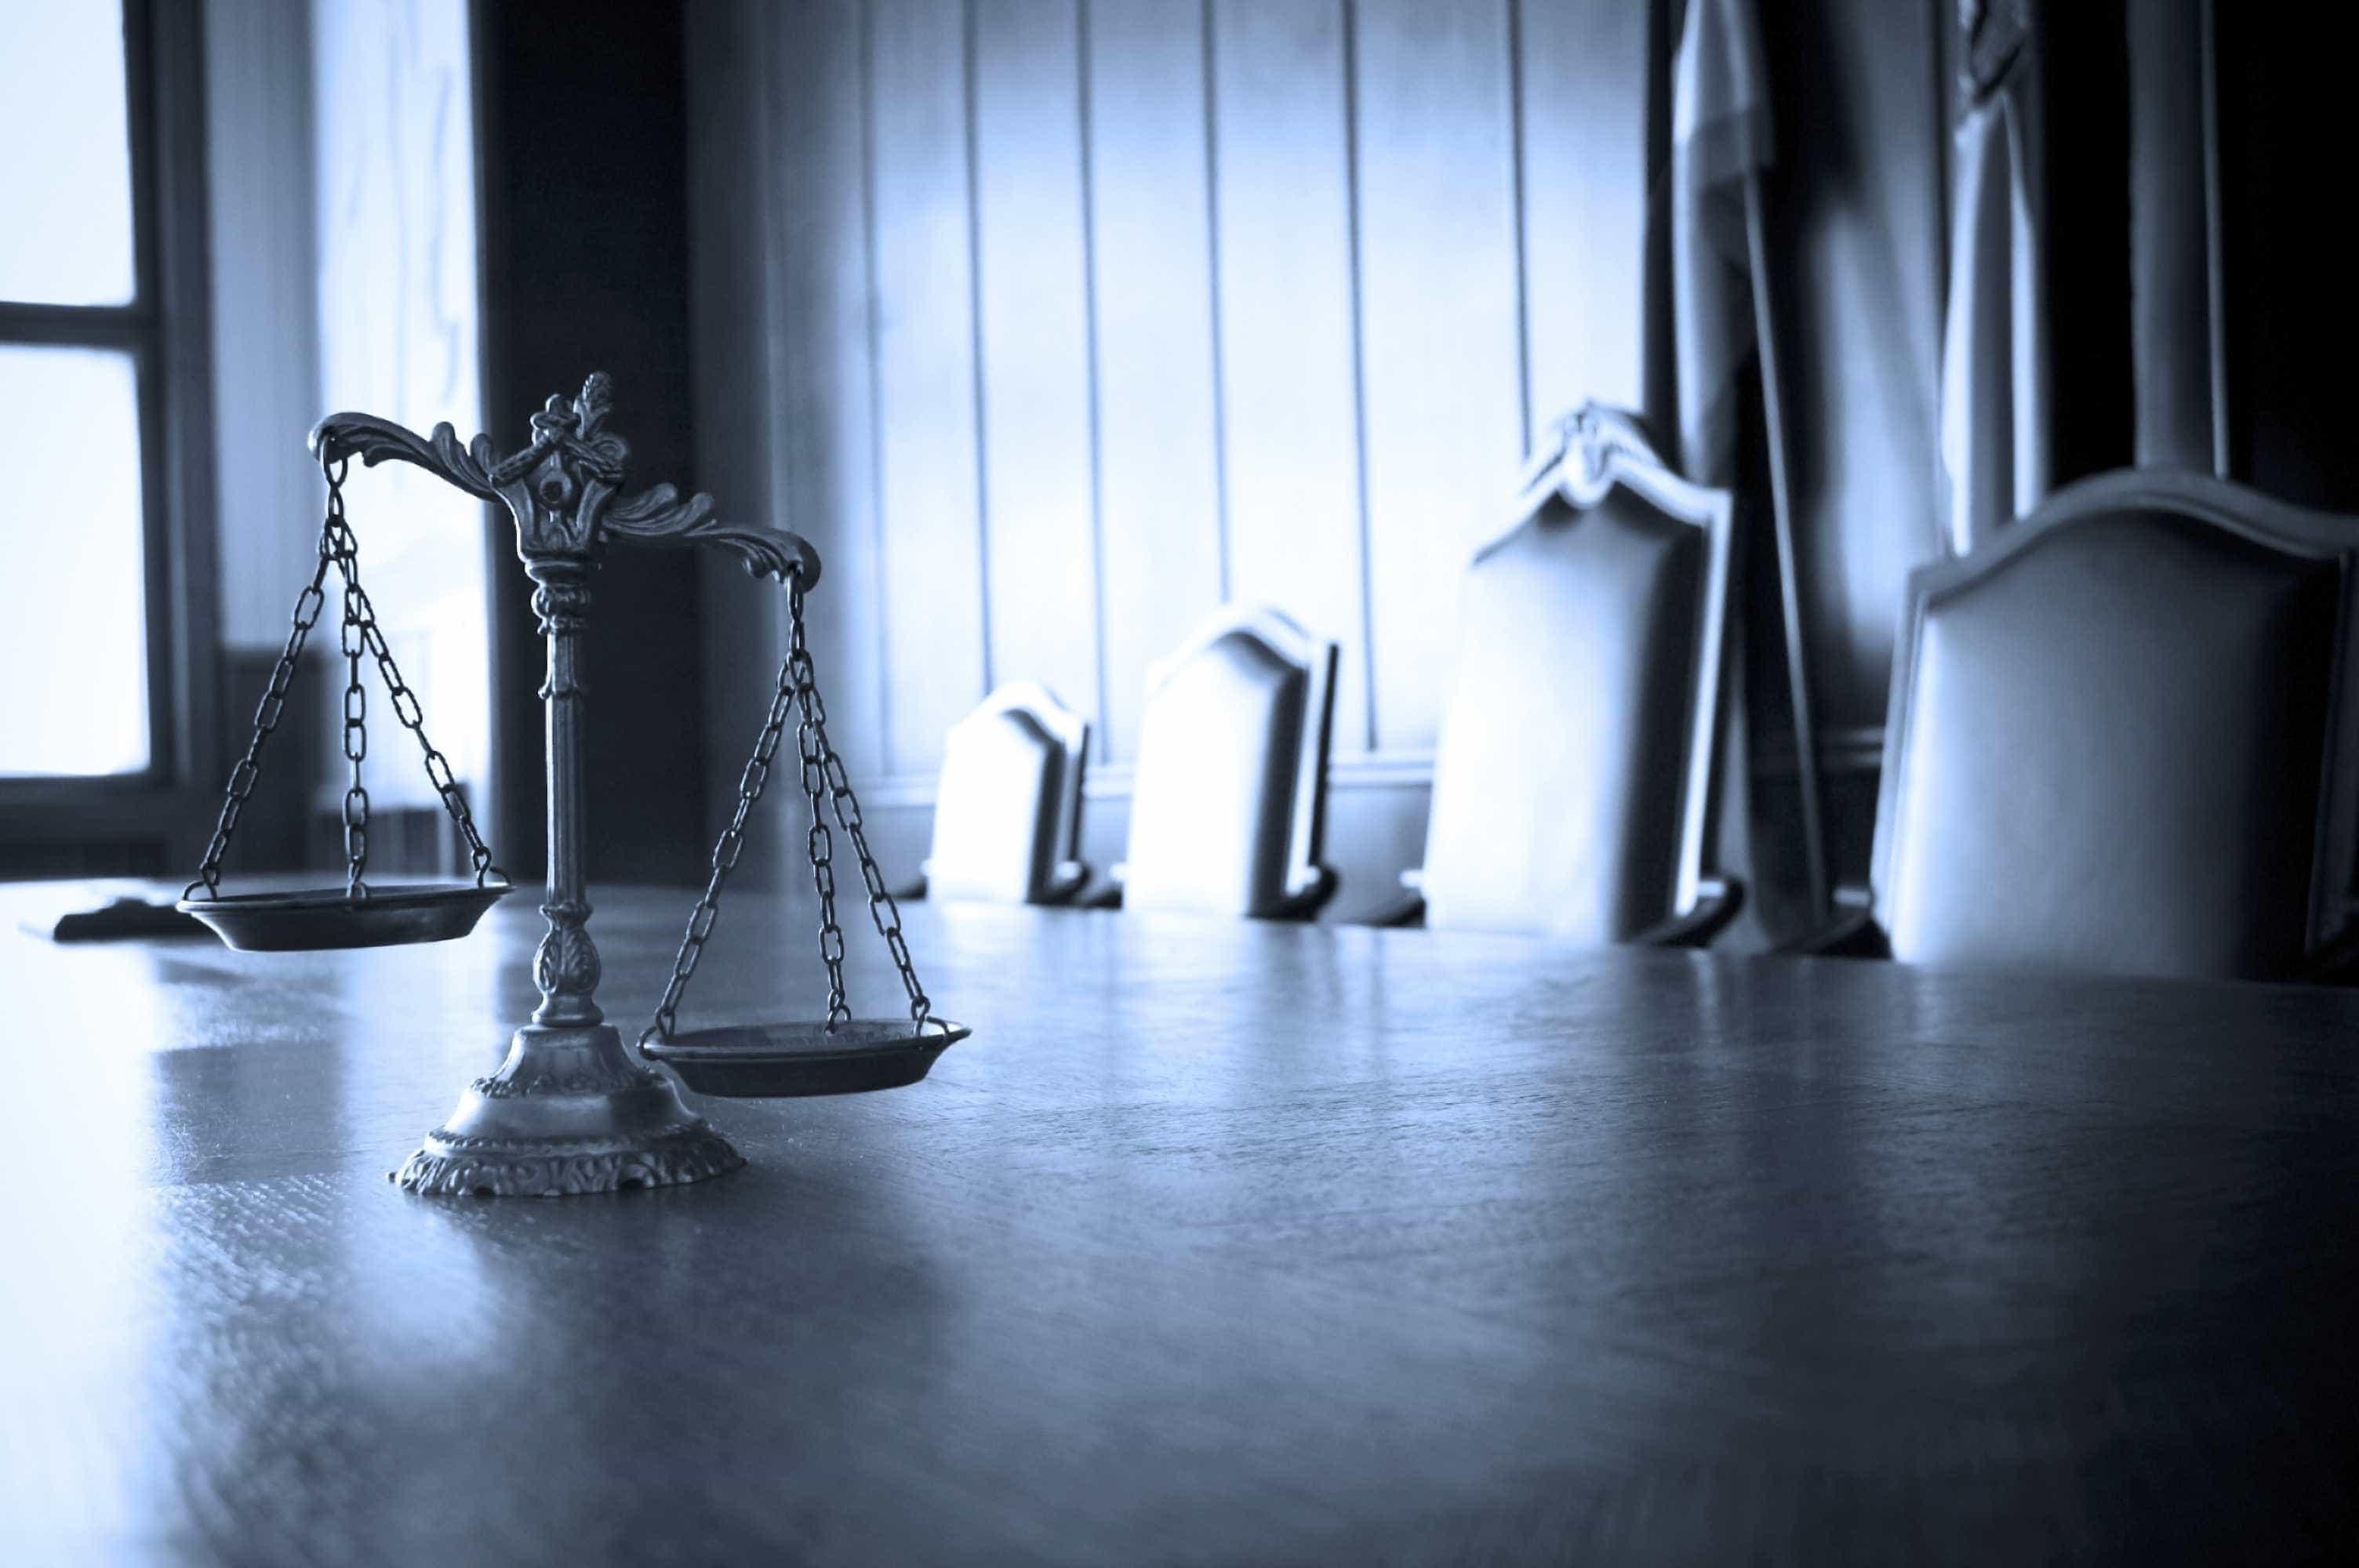 Padrasto suspeito de agredir menino vai aguardar julgamento em liberdade